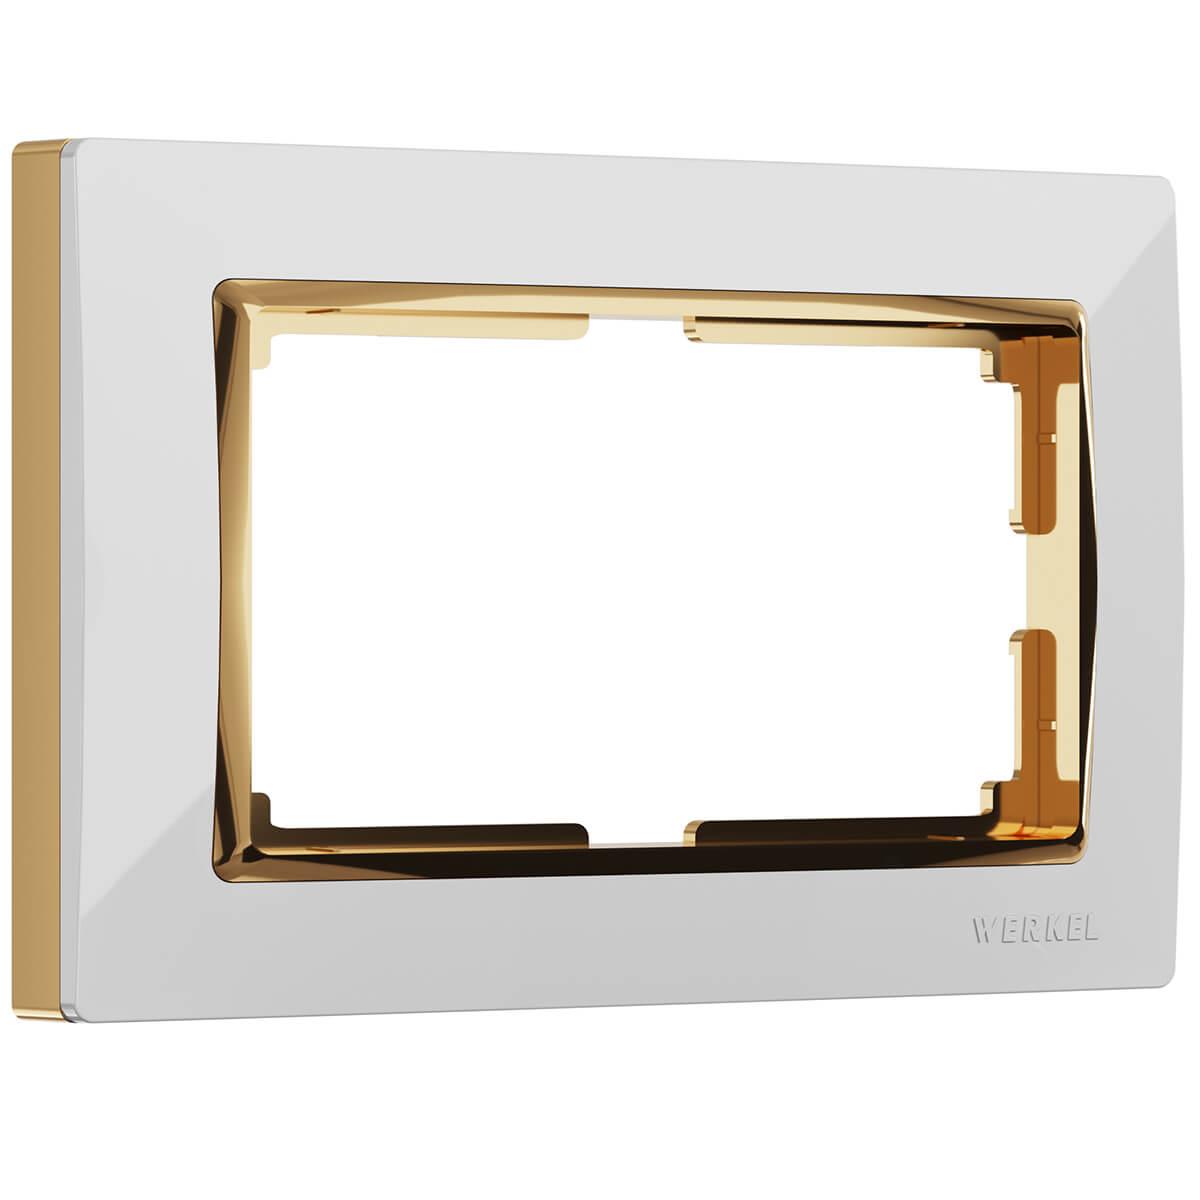 цена на Рамка Snabb для двойной розетки белый/золото WL03-Frame-01-DBL-white/GD 4690389083846